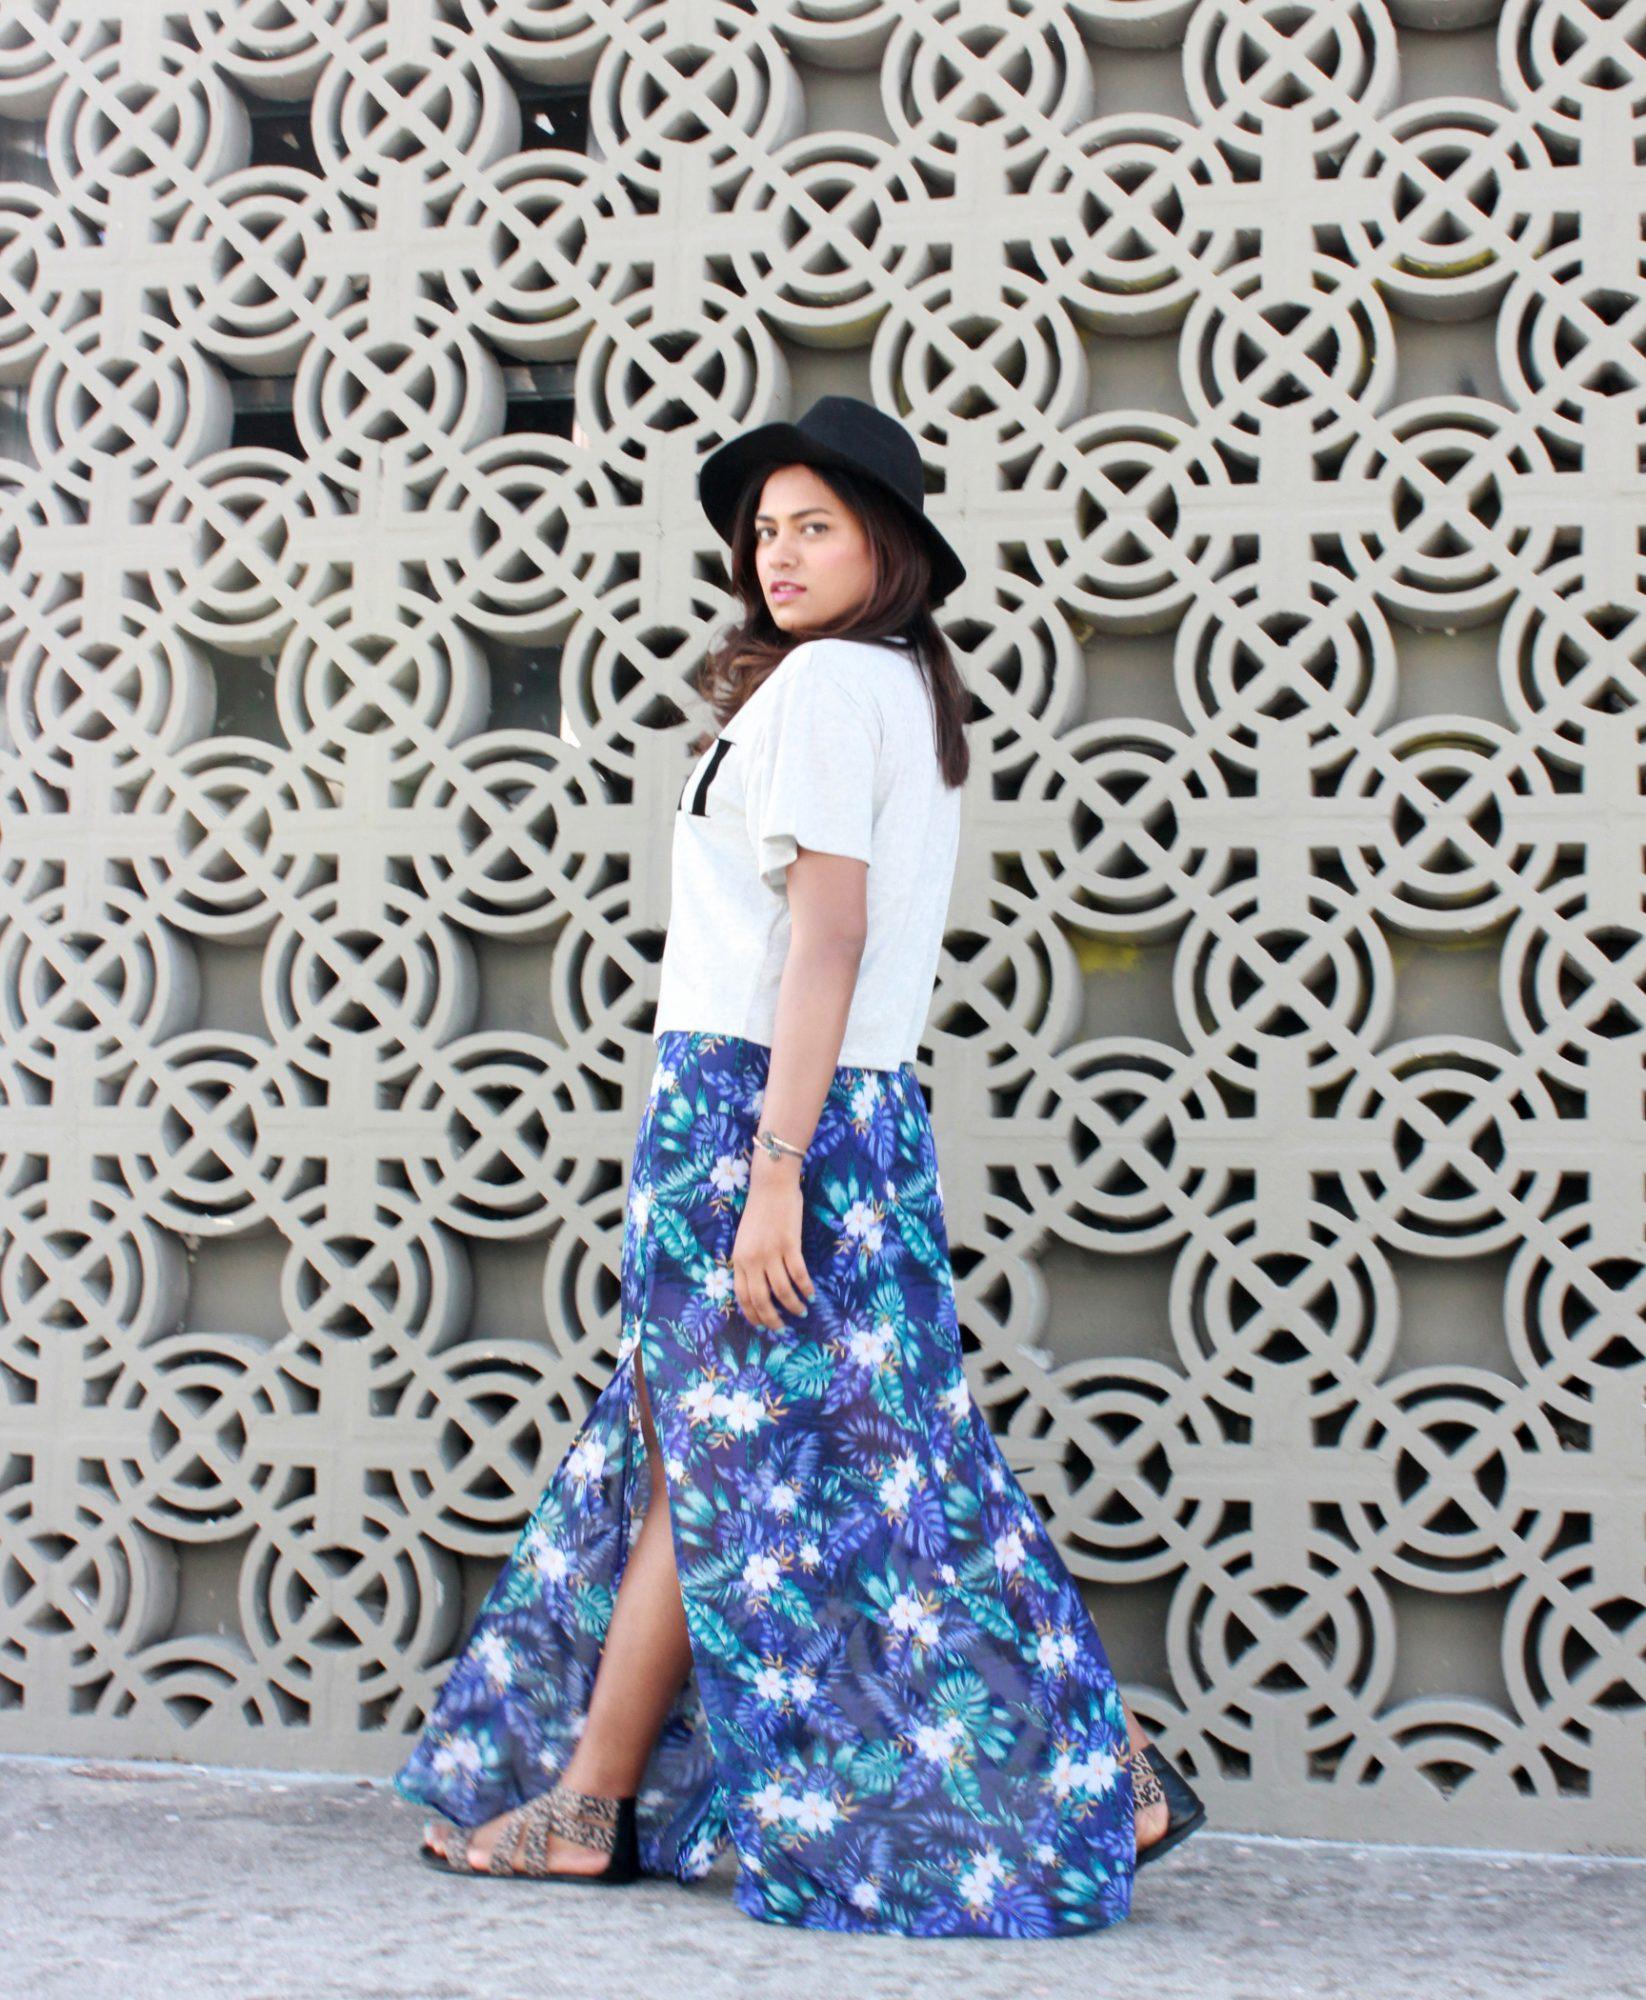 Miami Fashion Blogger H&M Outfit